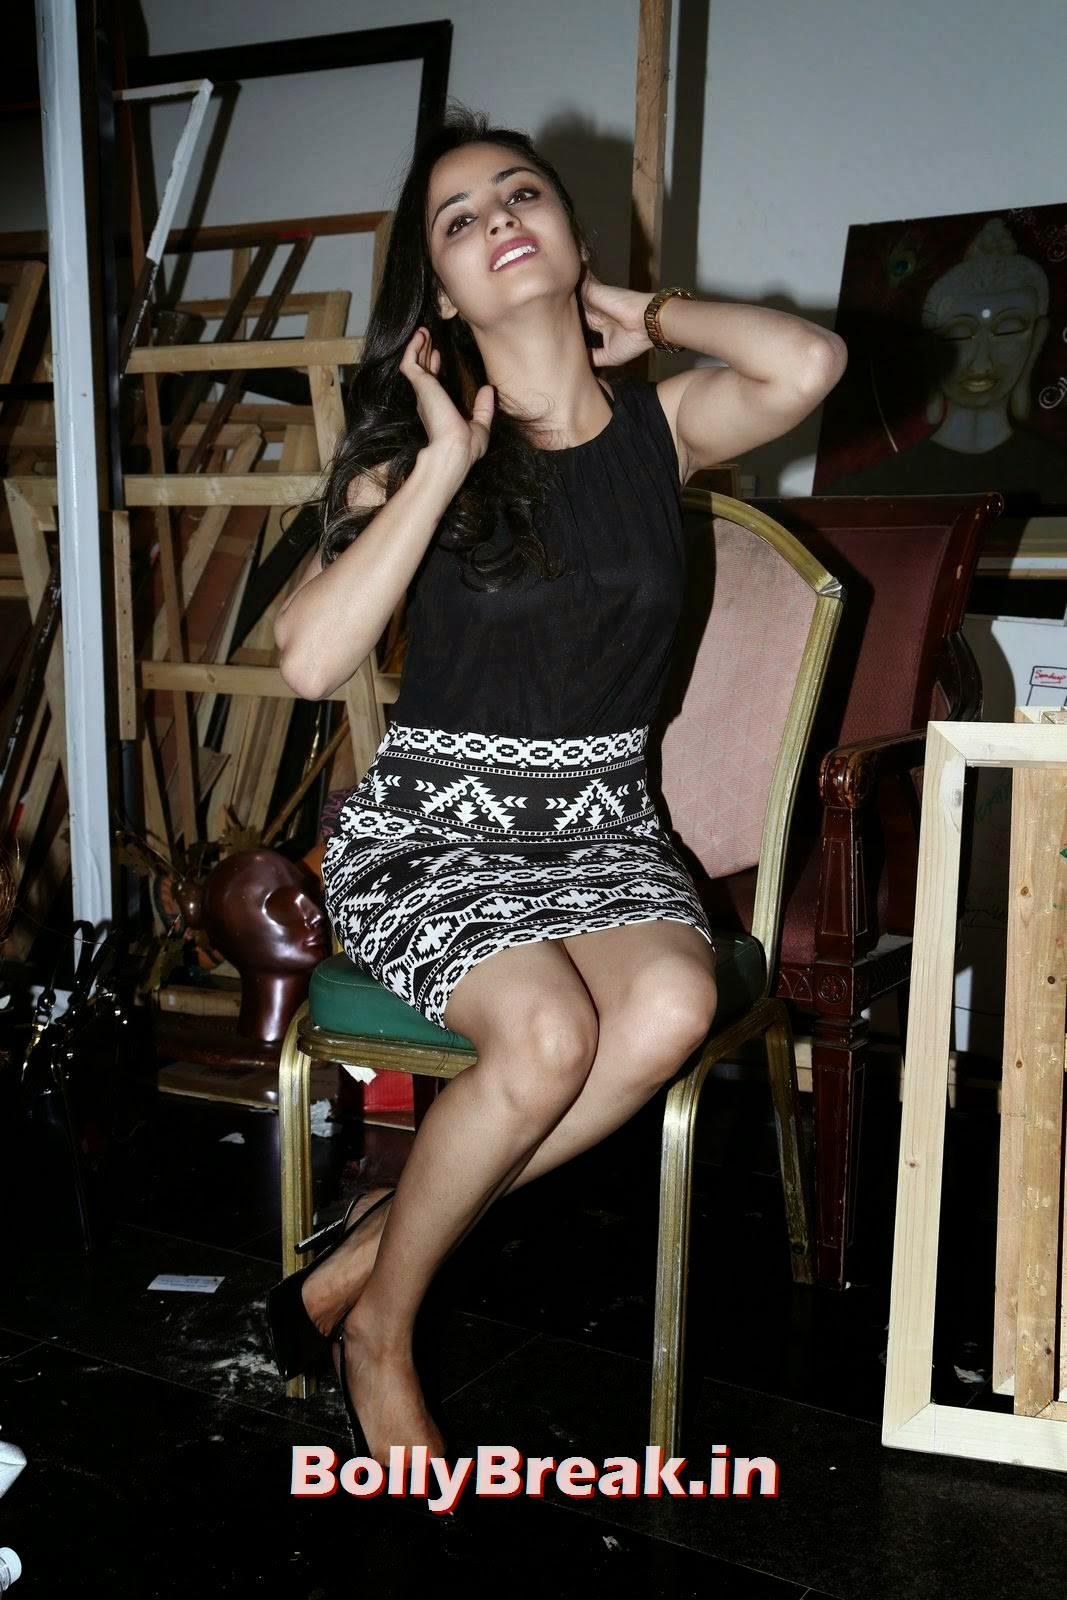 Actress Madirakshi Latest Photo Gallery, Actress Madirakshi Hot Pics in Skirt & Black Top